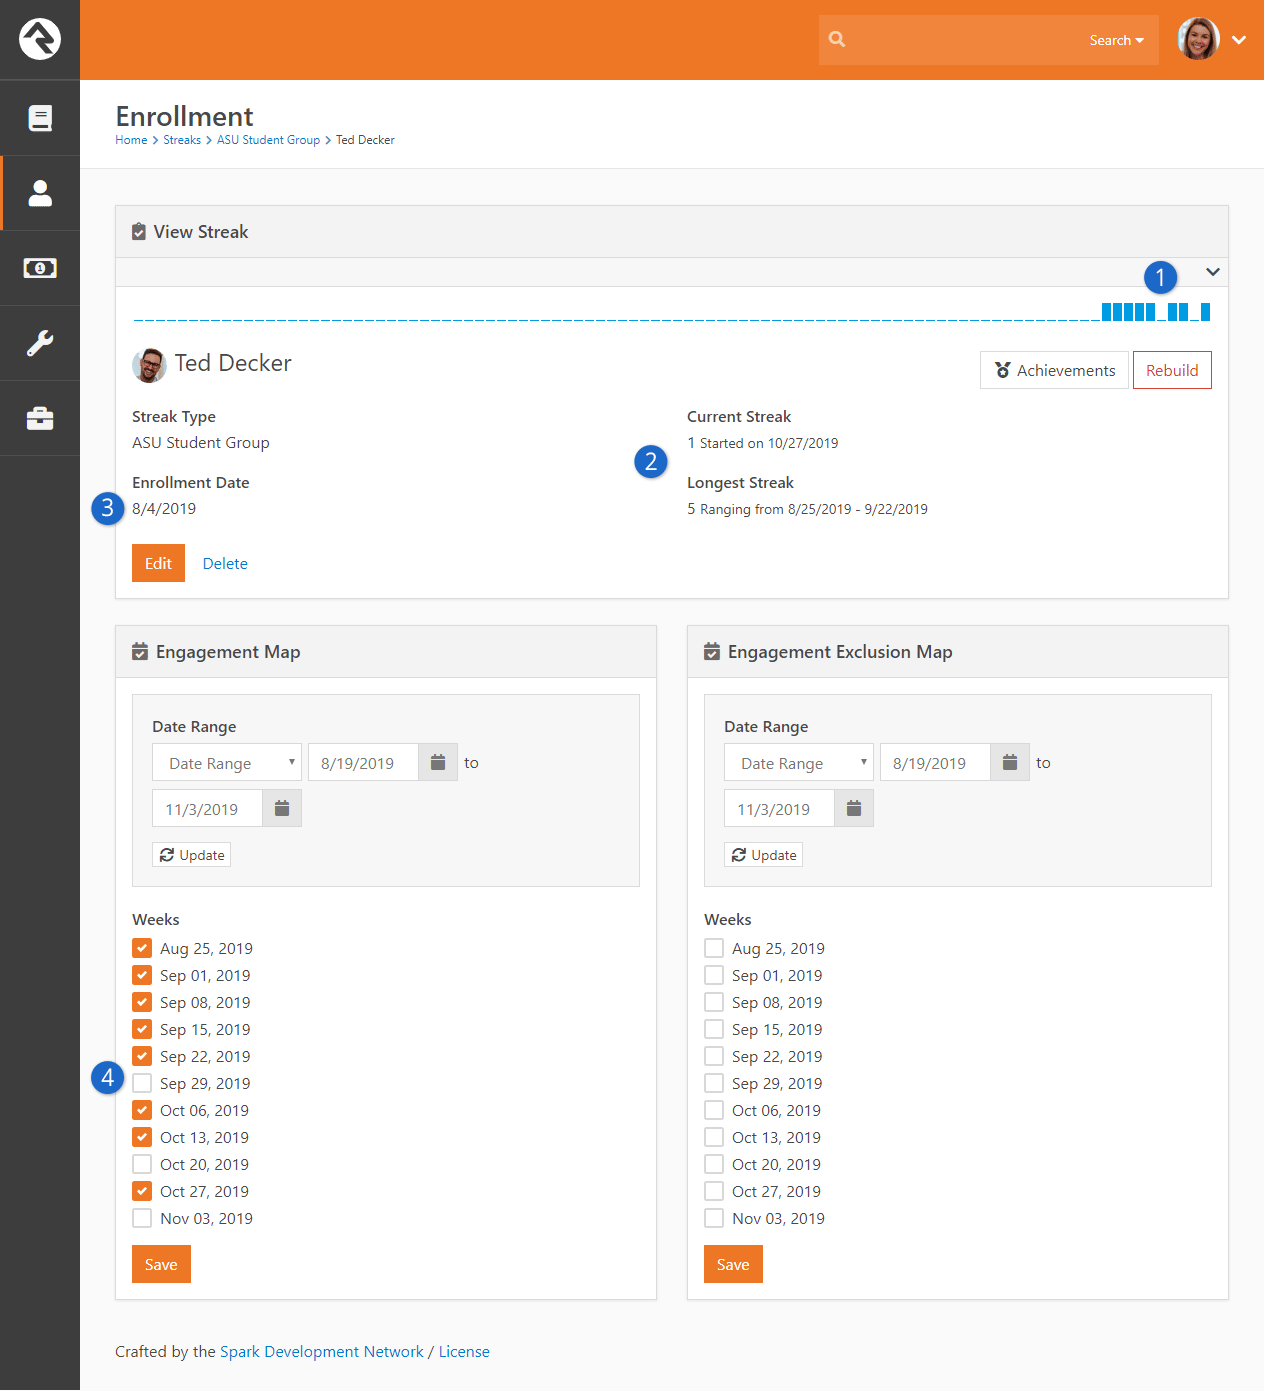 Enrollment Detail Page - Rebuild